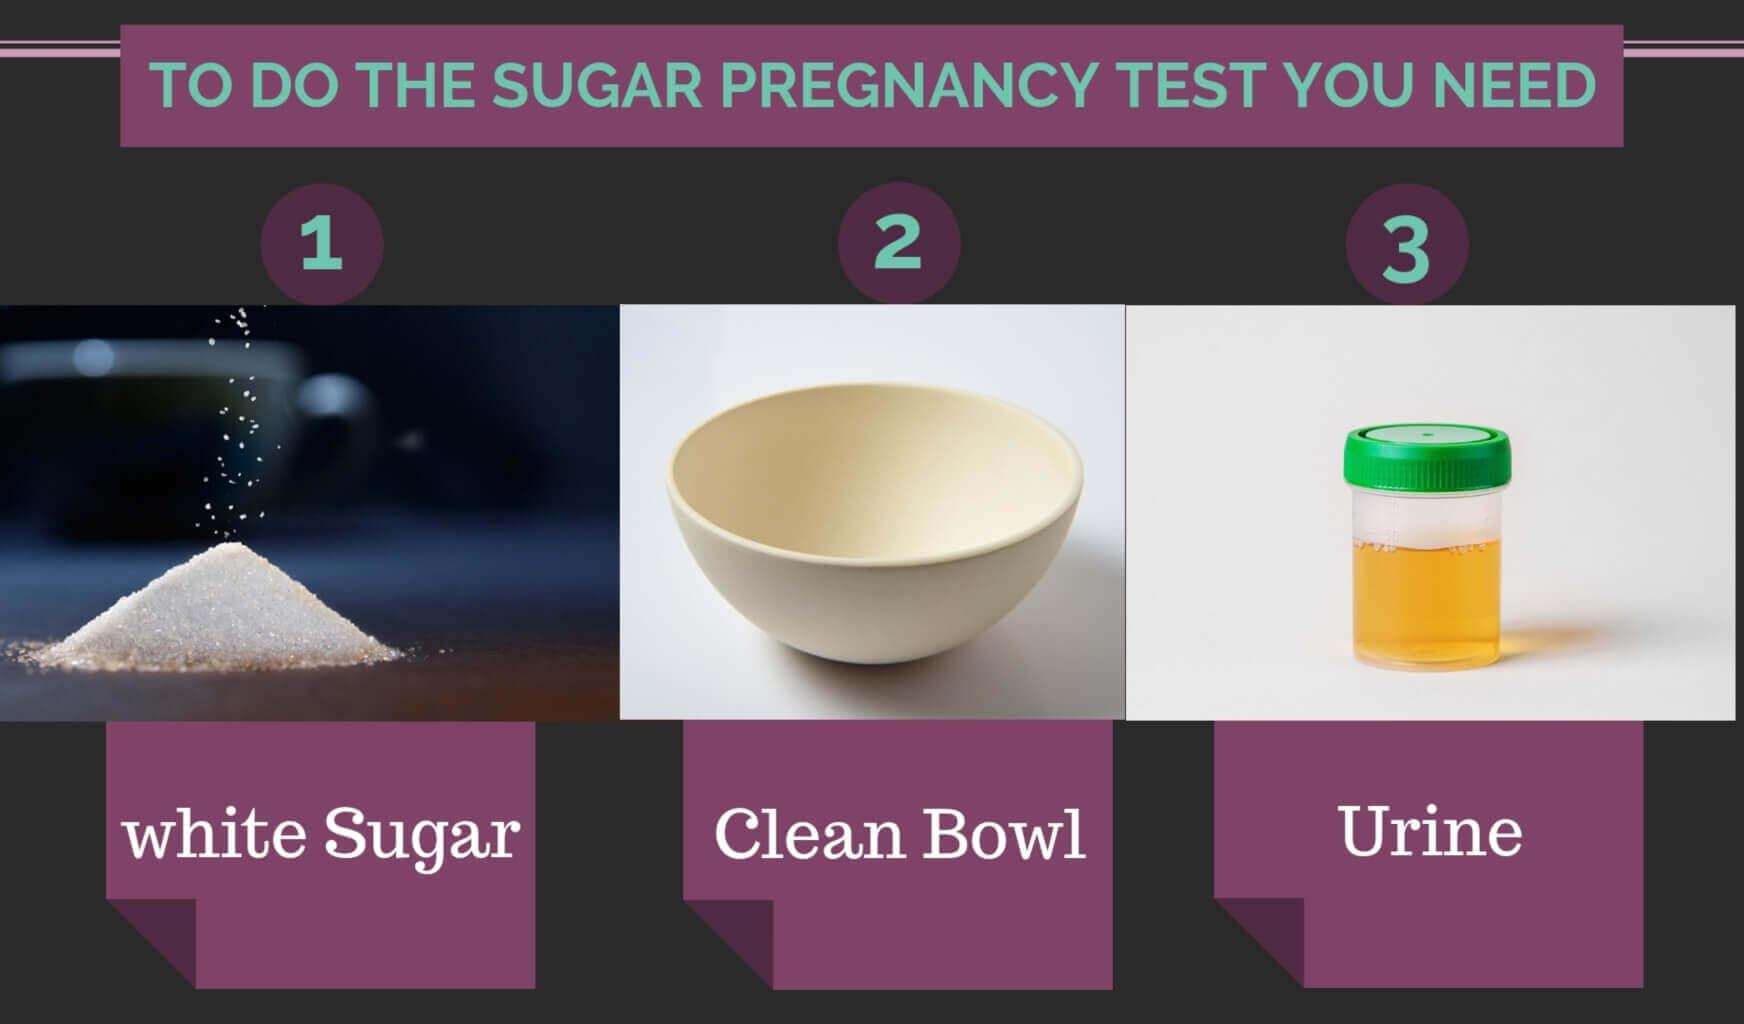 Ingredients-for-sugar-pregnancy-test-Info-graphic